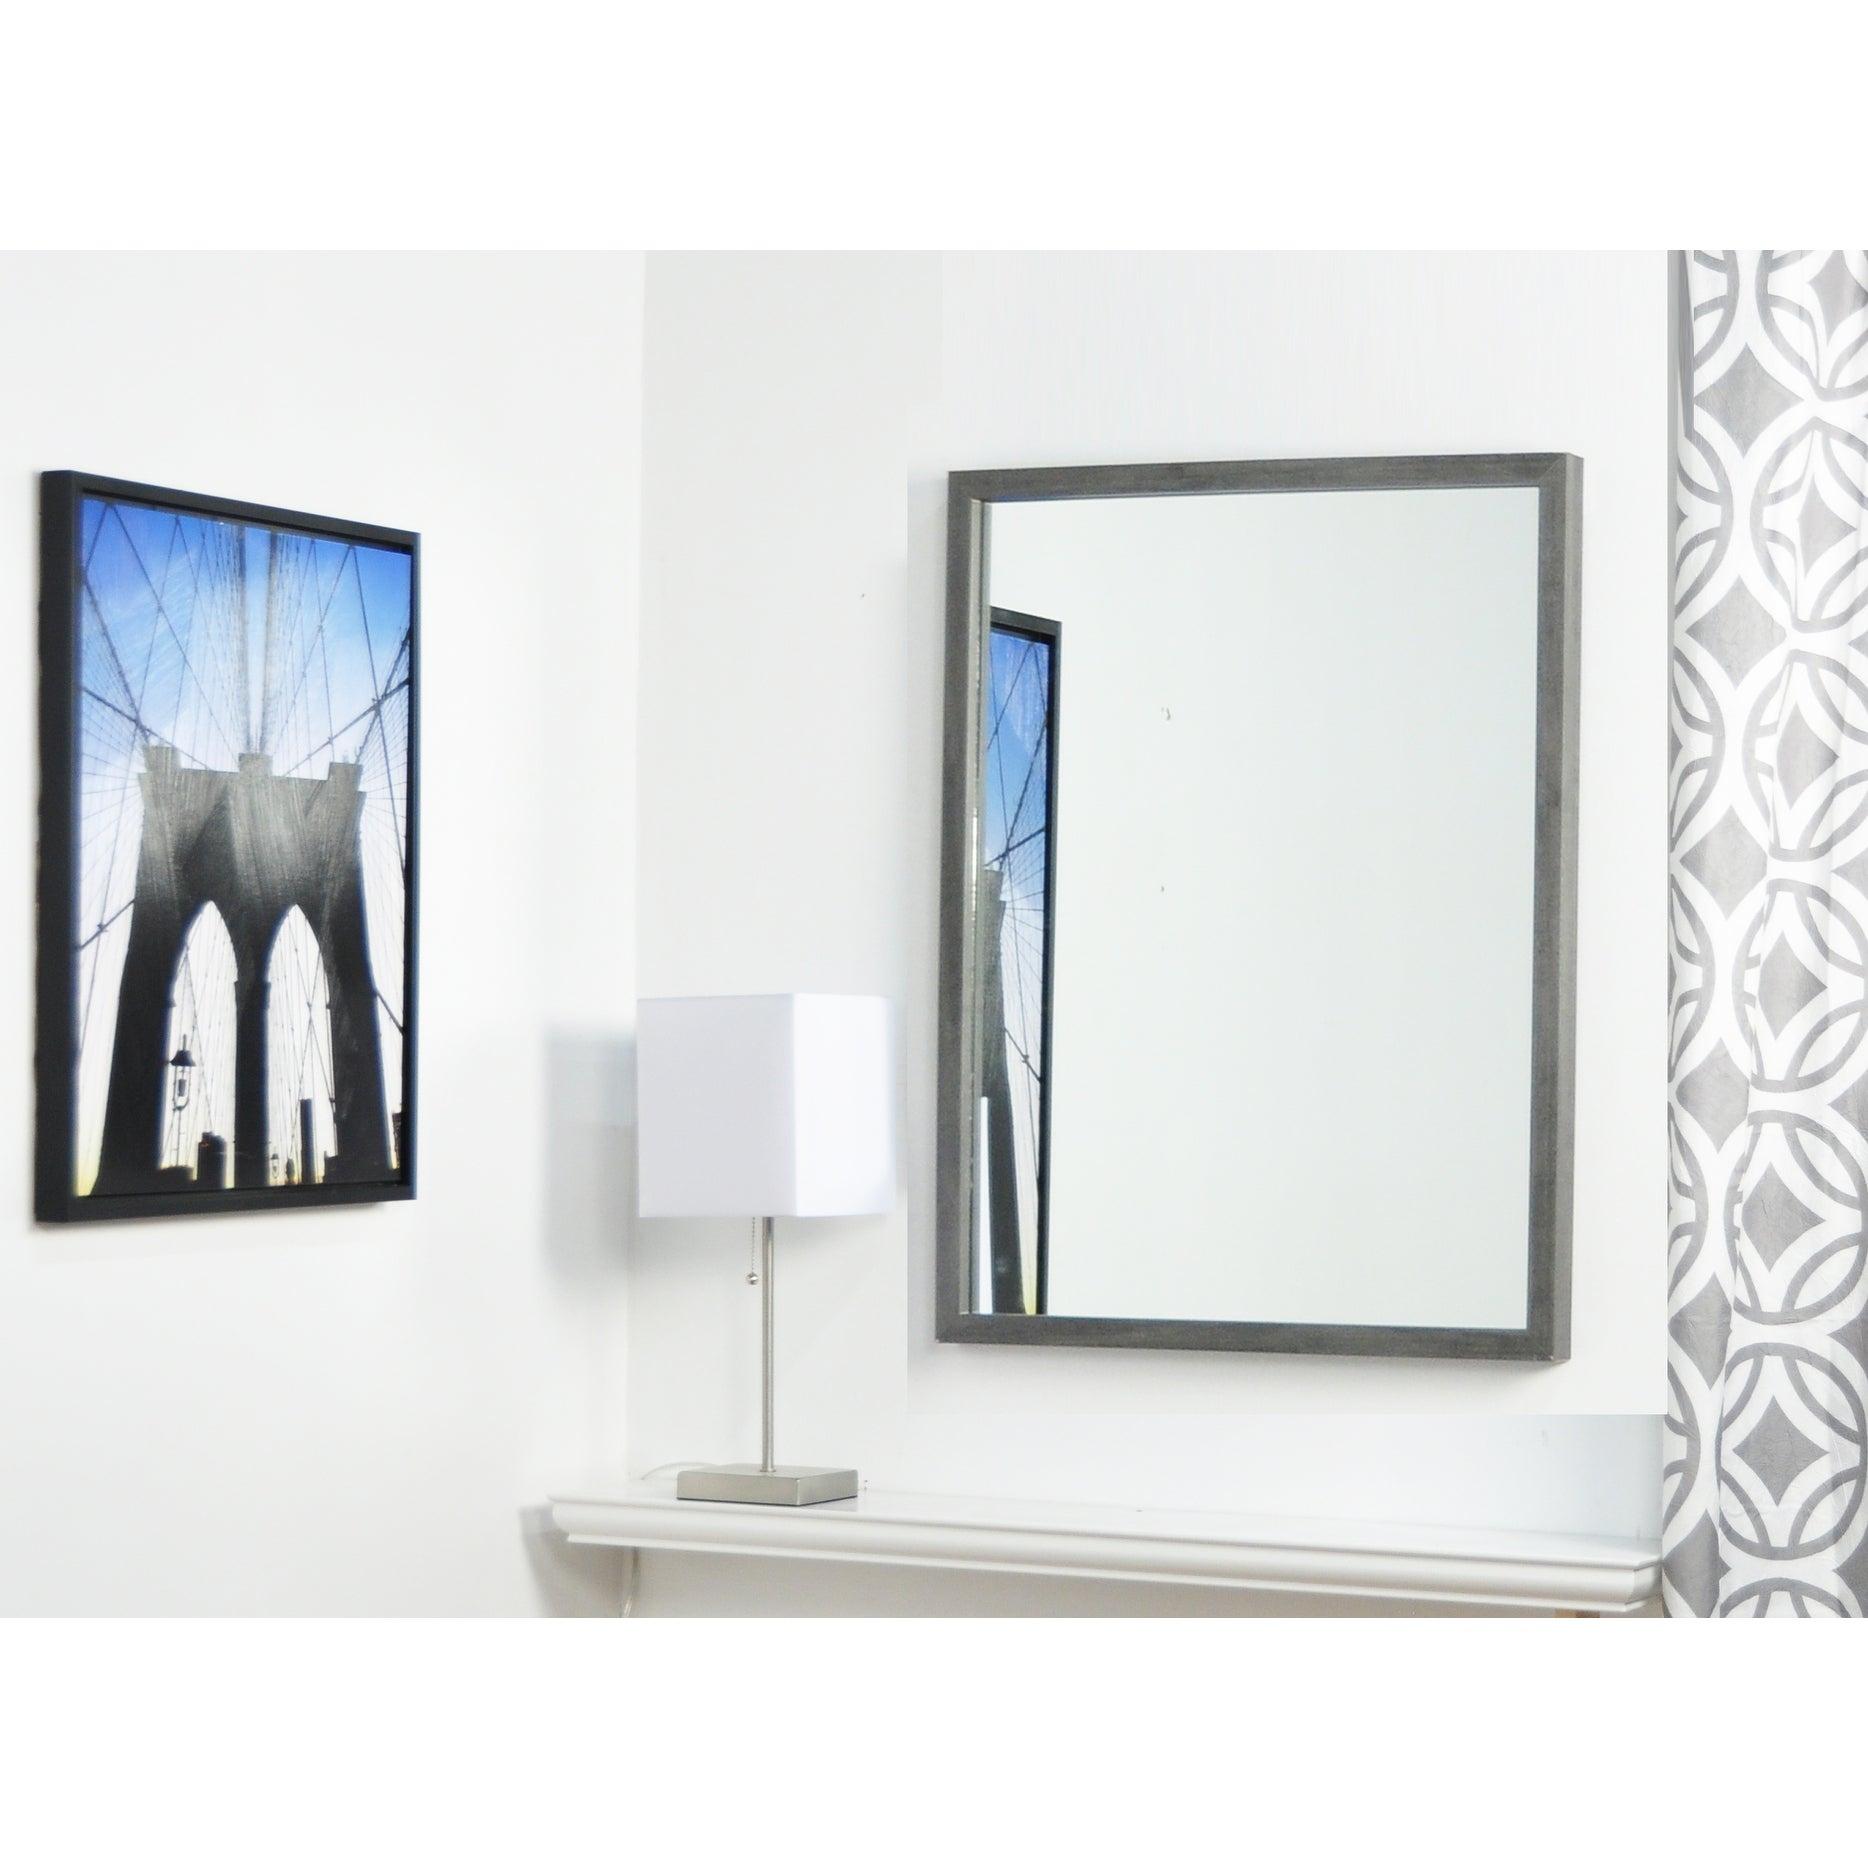 Brandtworks Minimal Slate Gray Framed Vanity Wall Mirror  (Image 2 of 20)